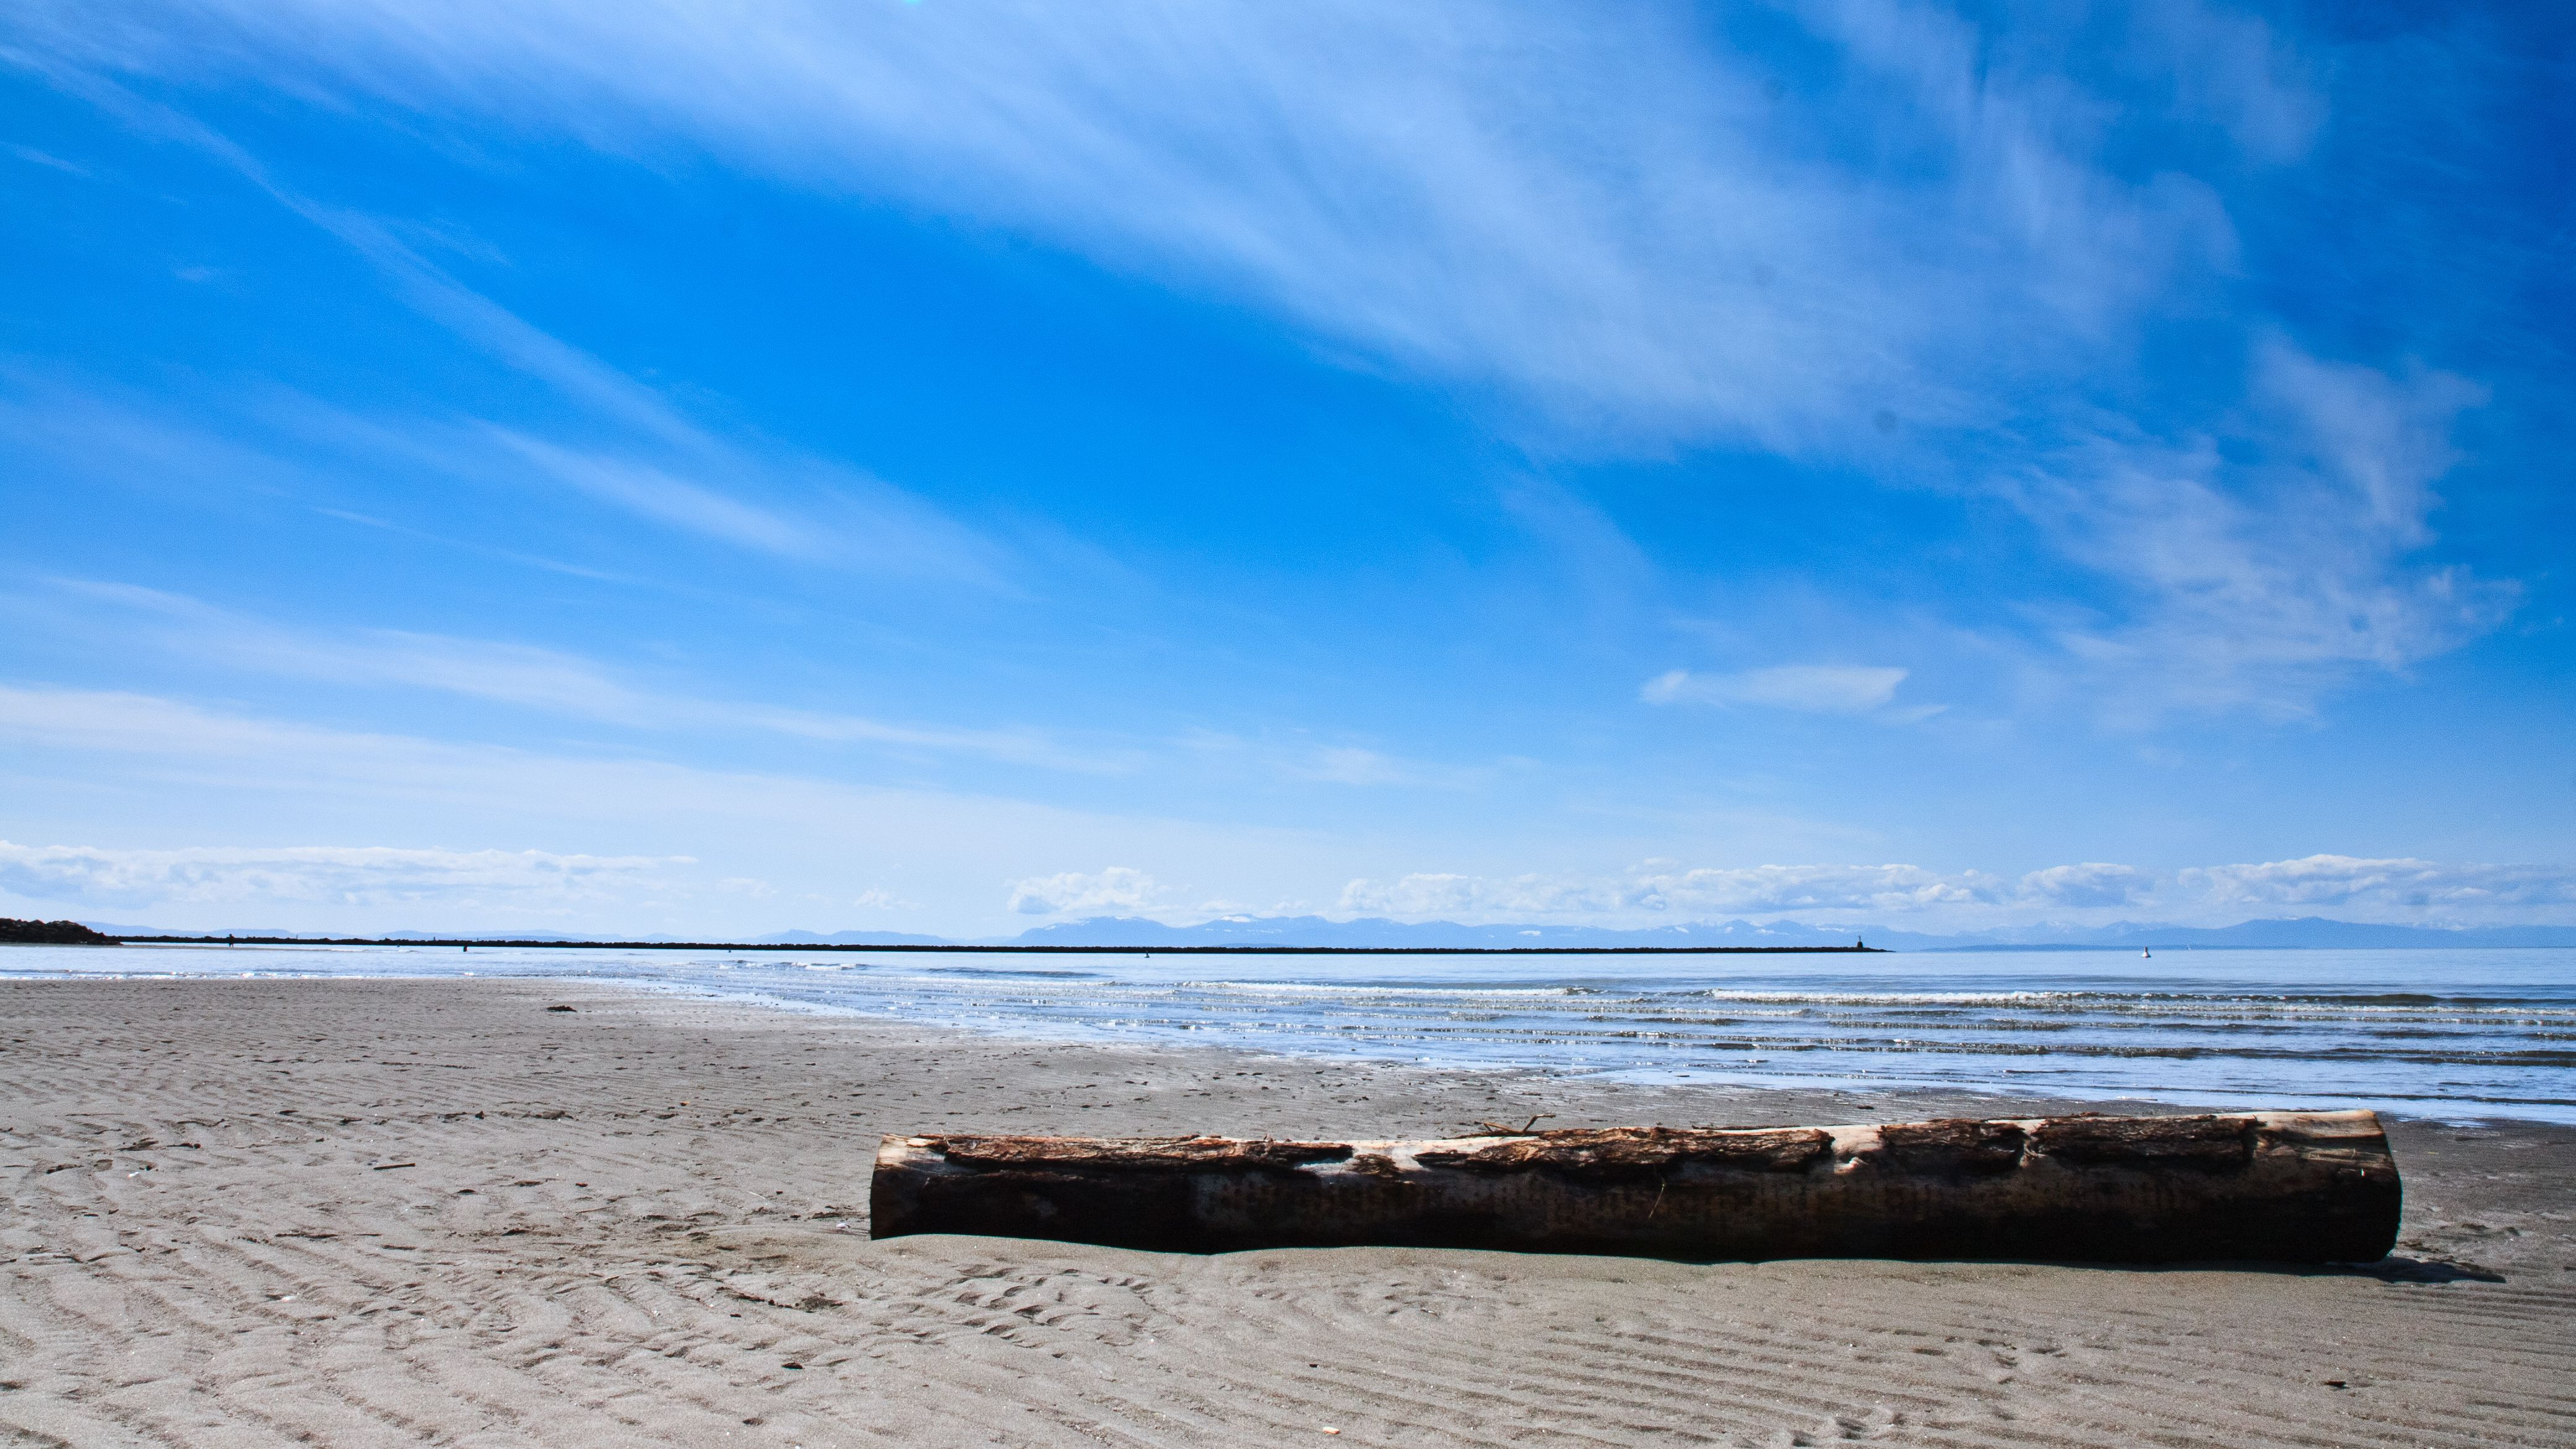 Photos for Wreck Beach - Yelp